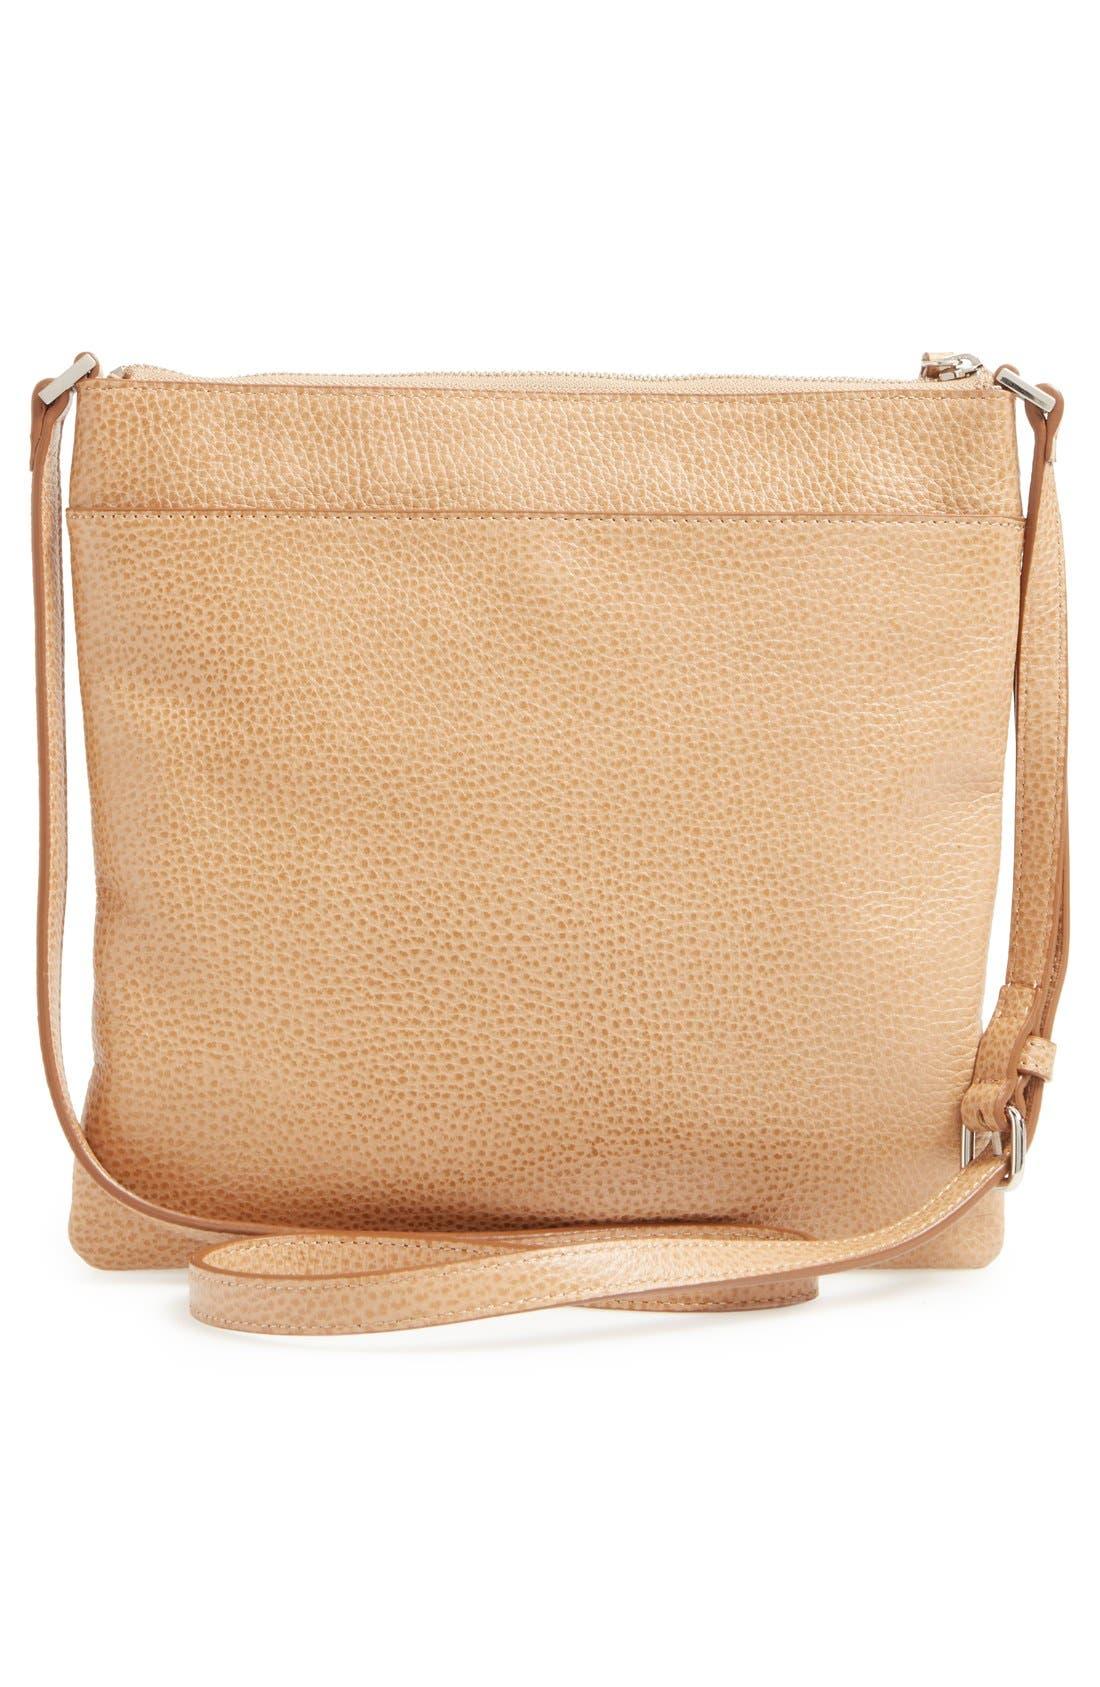 Alternate Image 3  - Halogen® Tasseled Leather Crossbody Bag